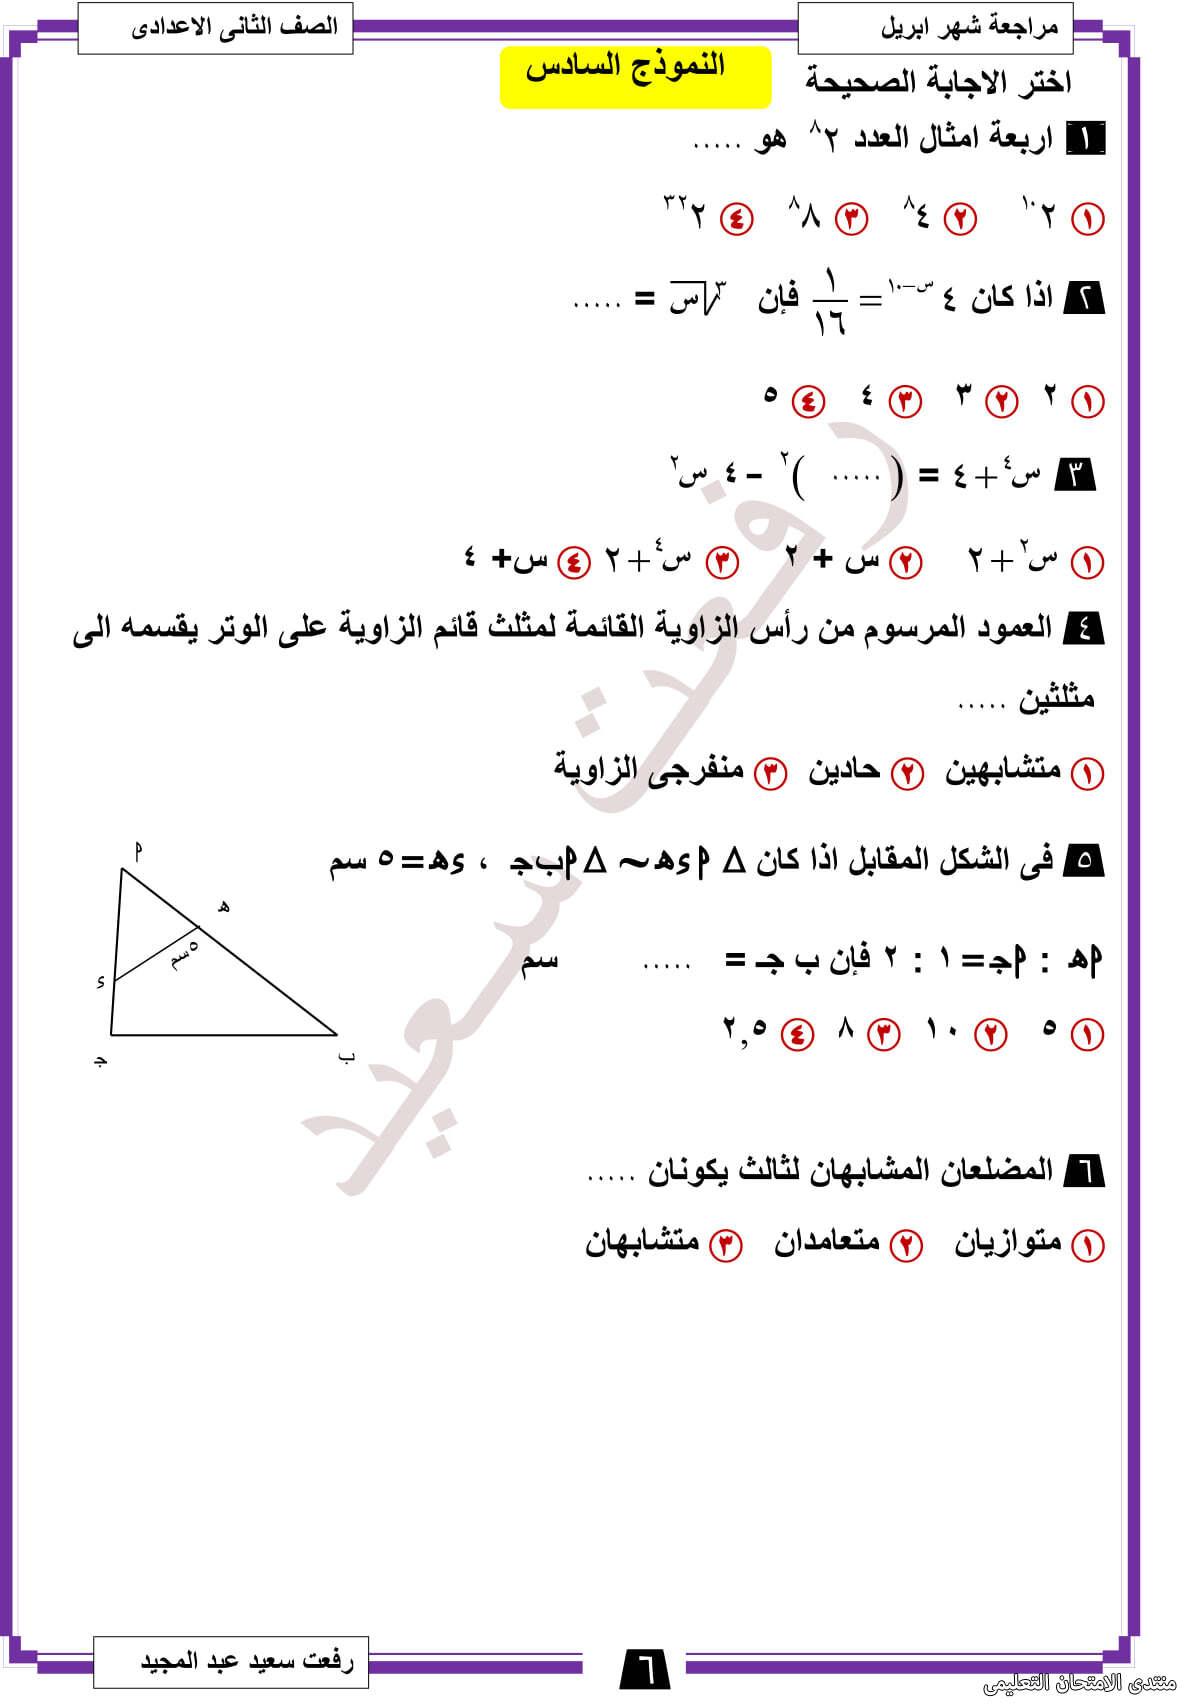 exam-eg.com_161904908778486.jpg